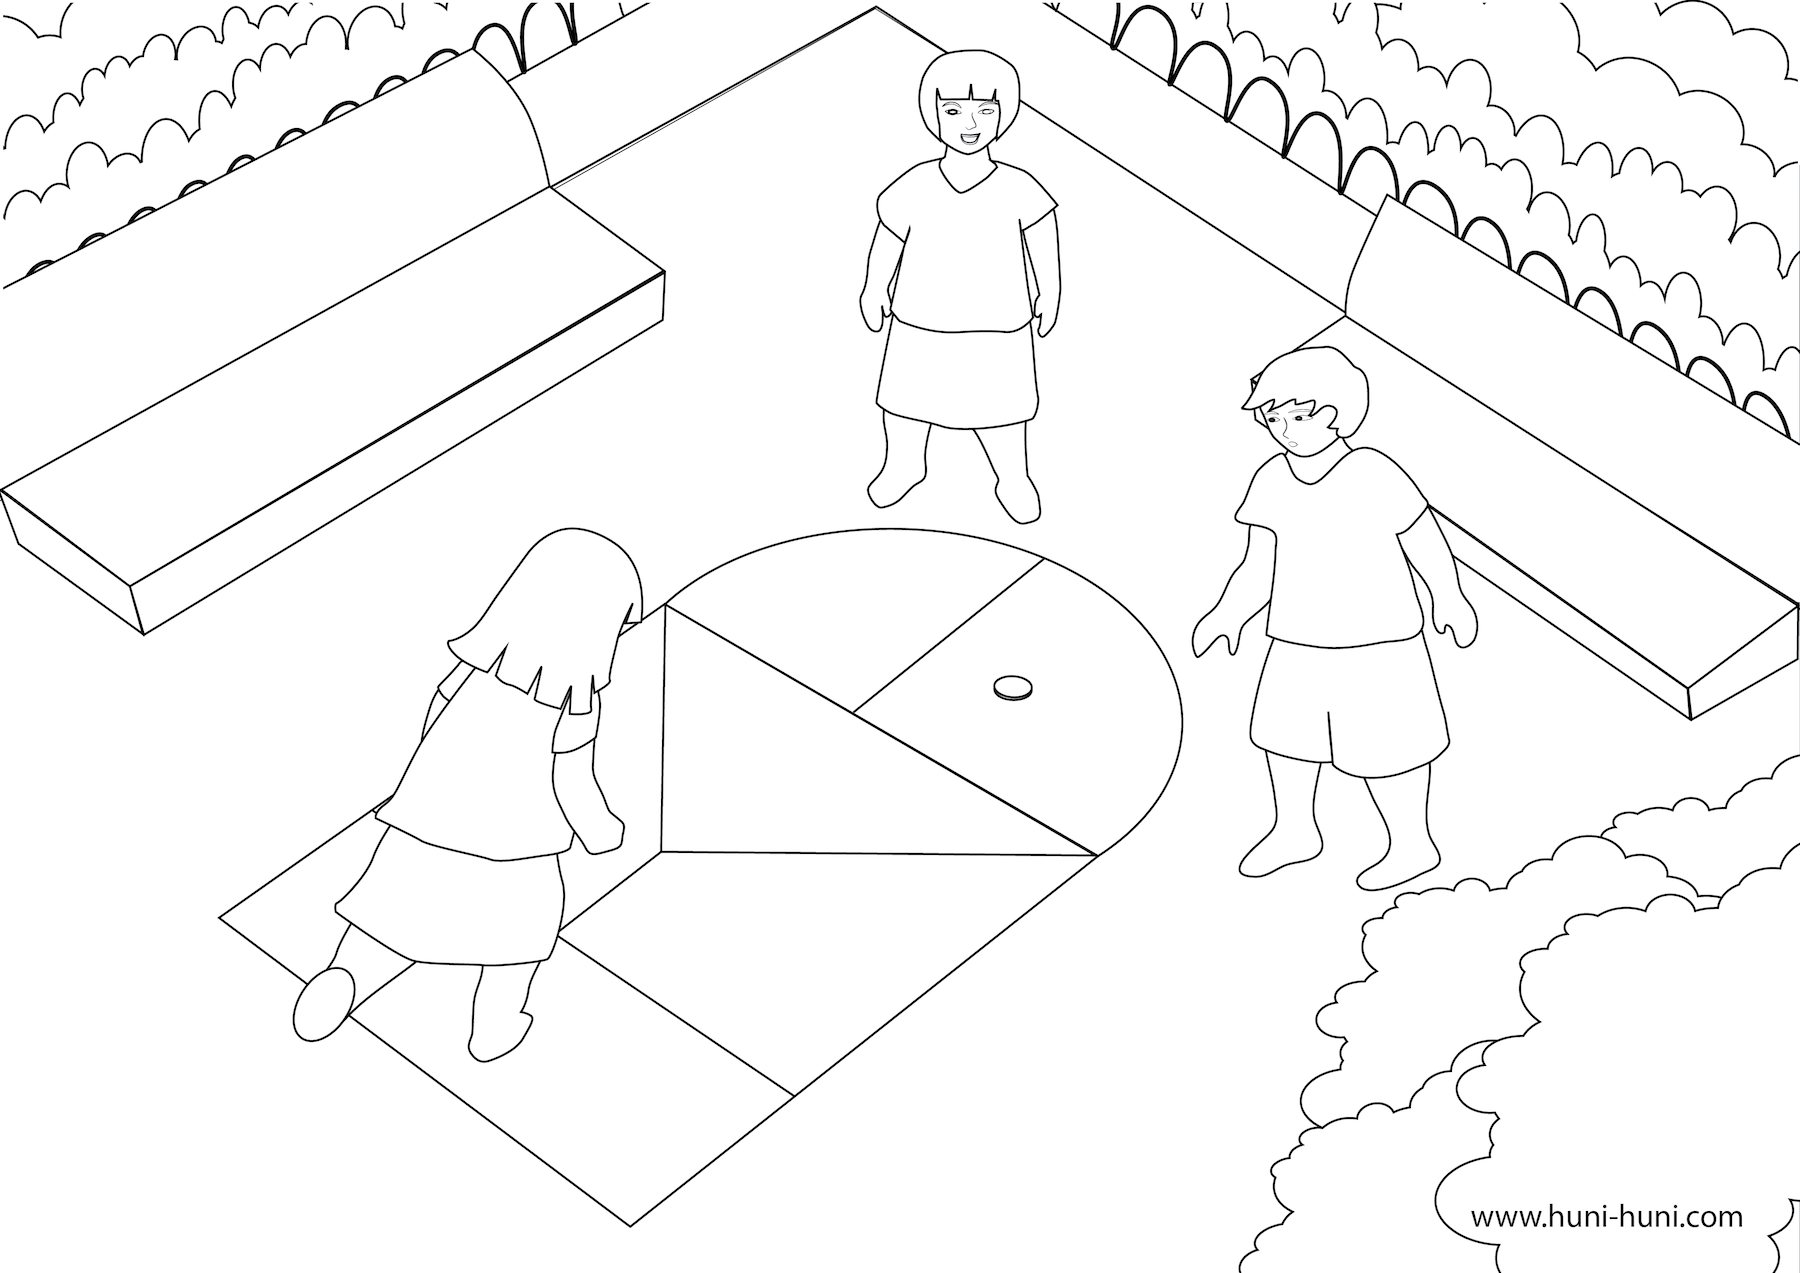 huni-huni-coloring-page-piko